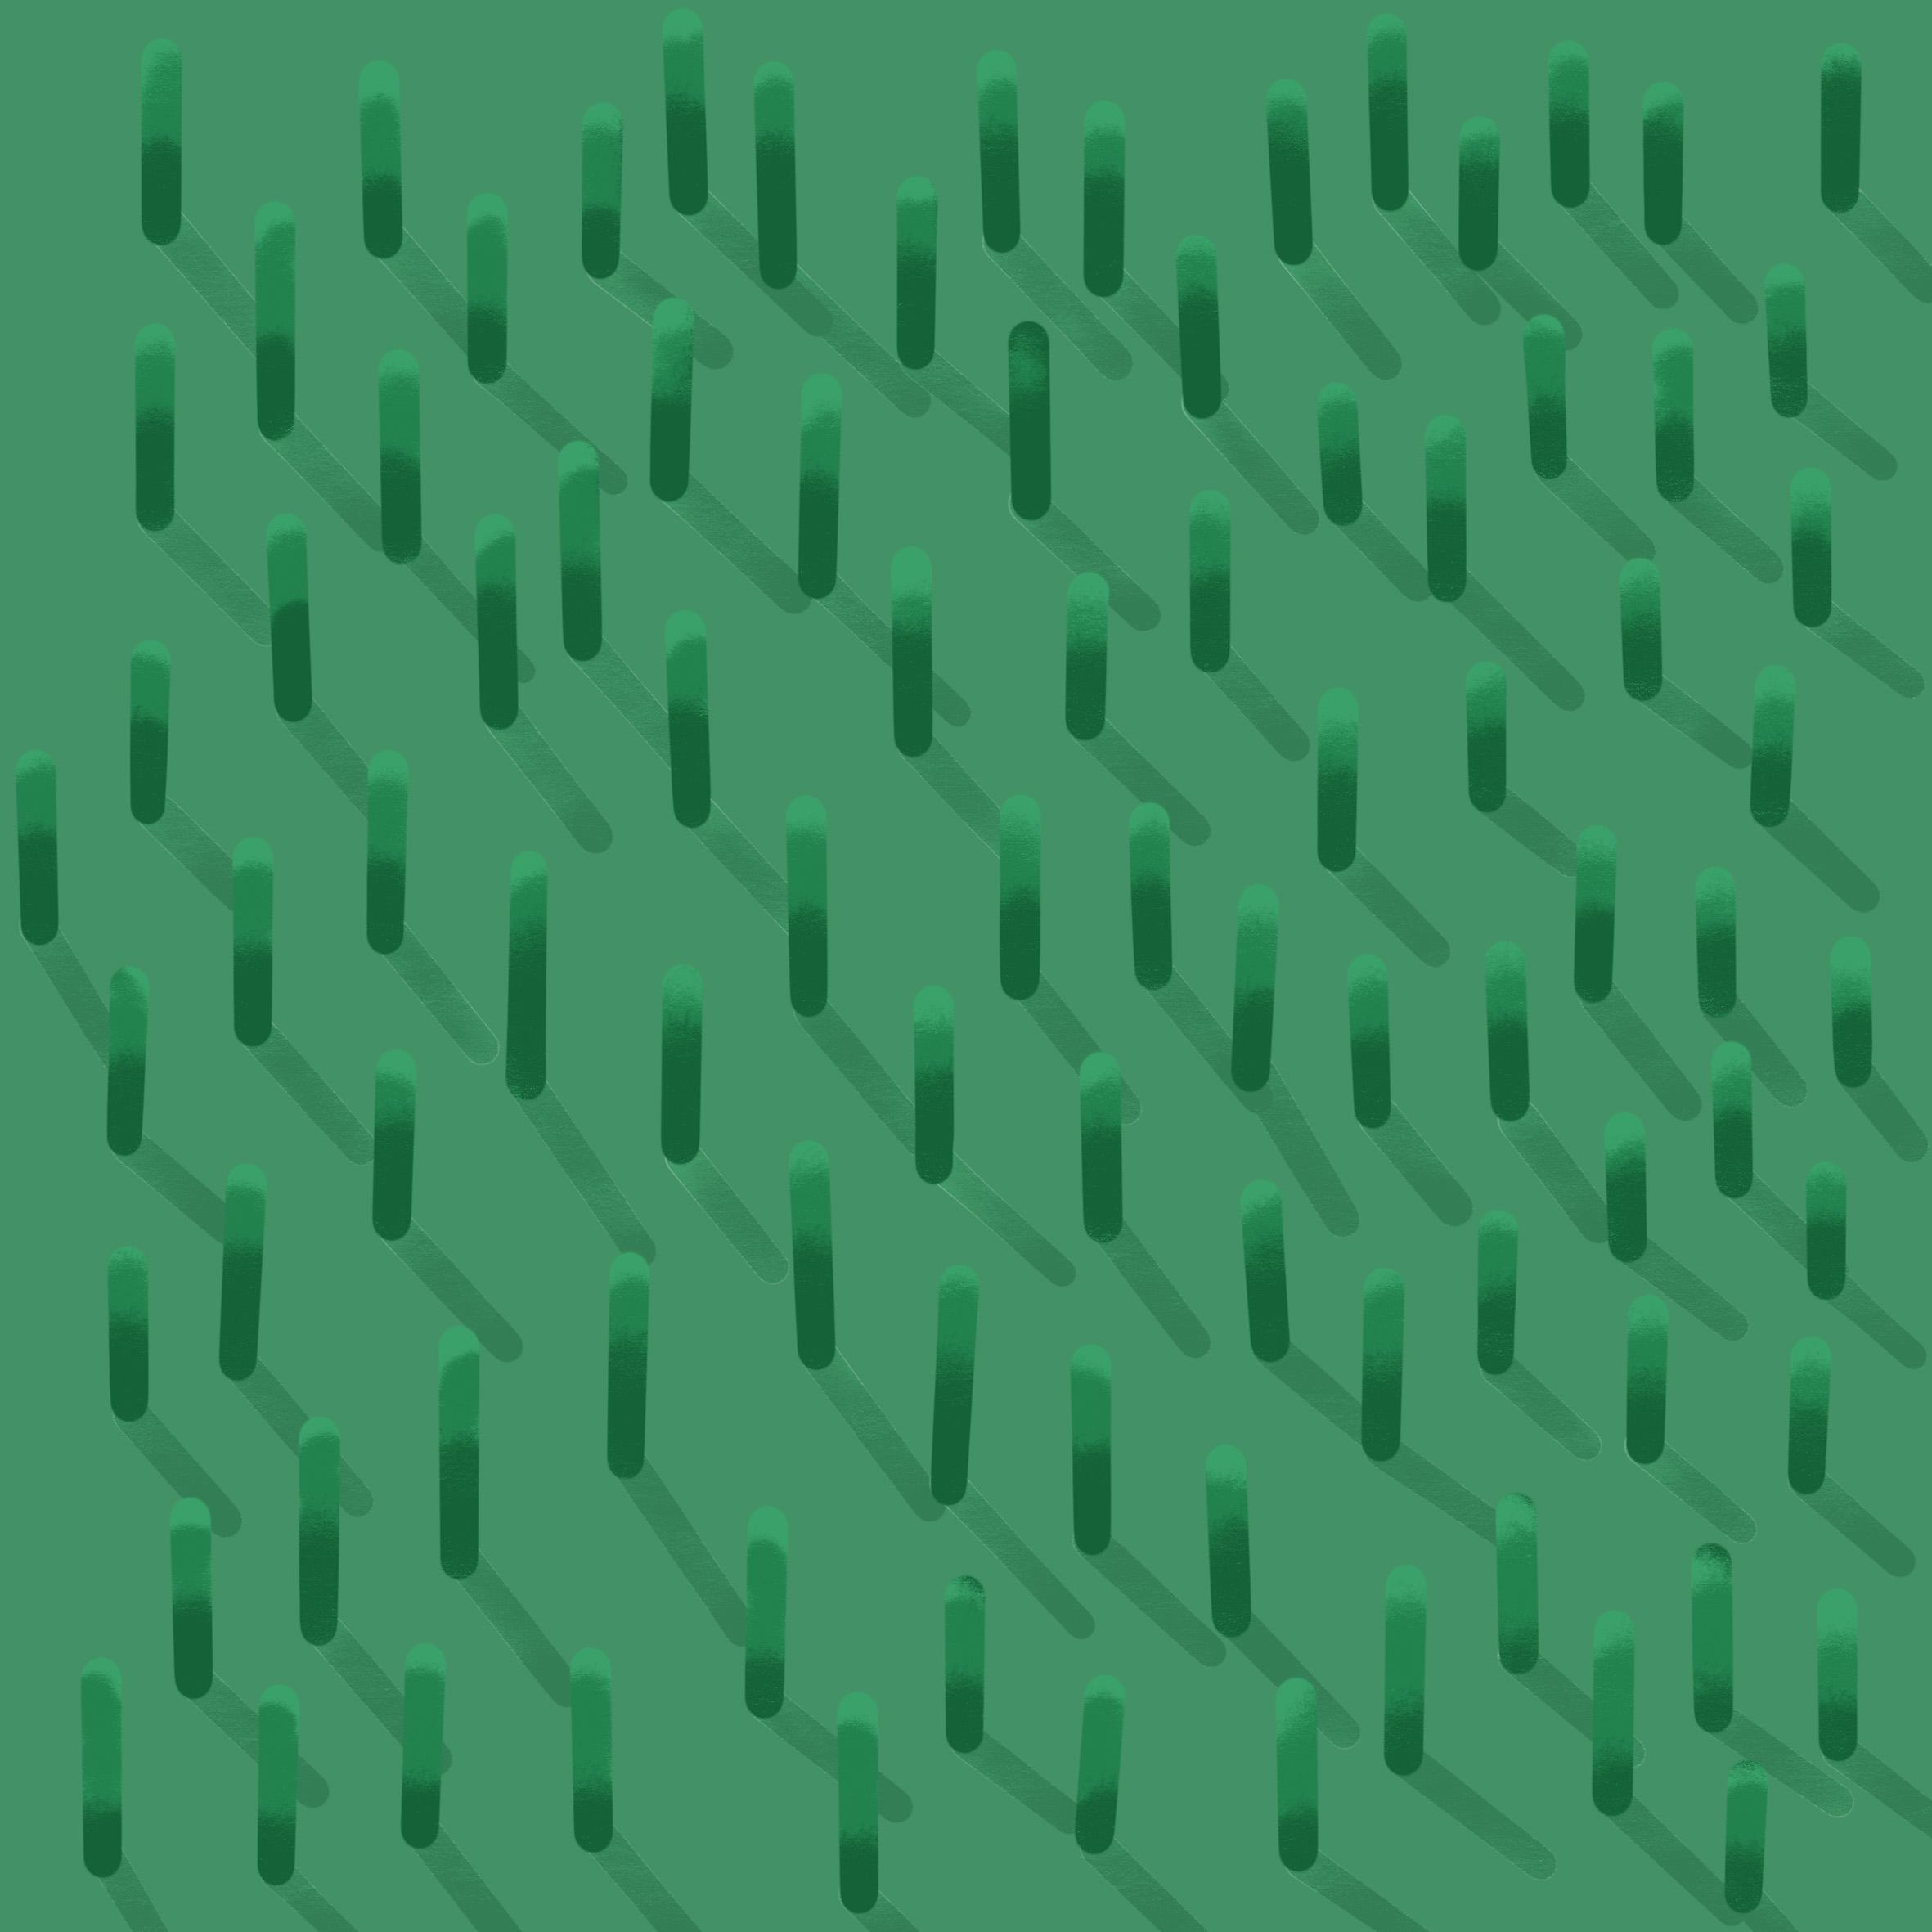 Gras zonderlagenkleinst kopie.jpg